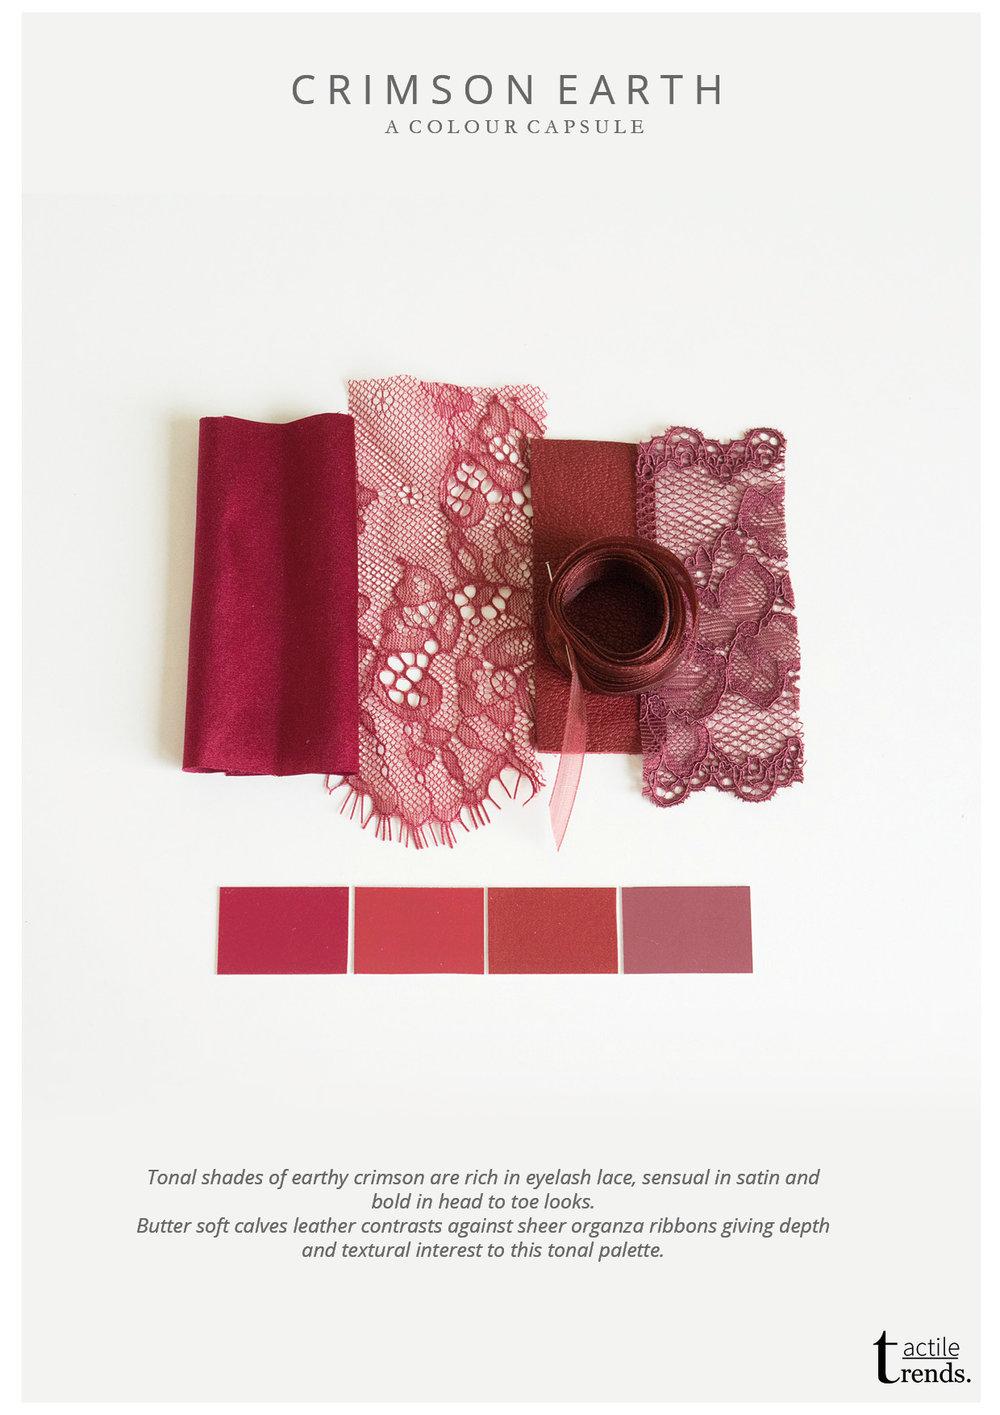 crimson-earth-colour-capsule